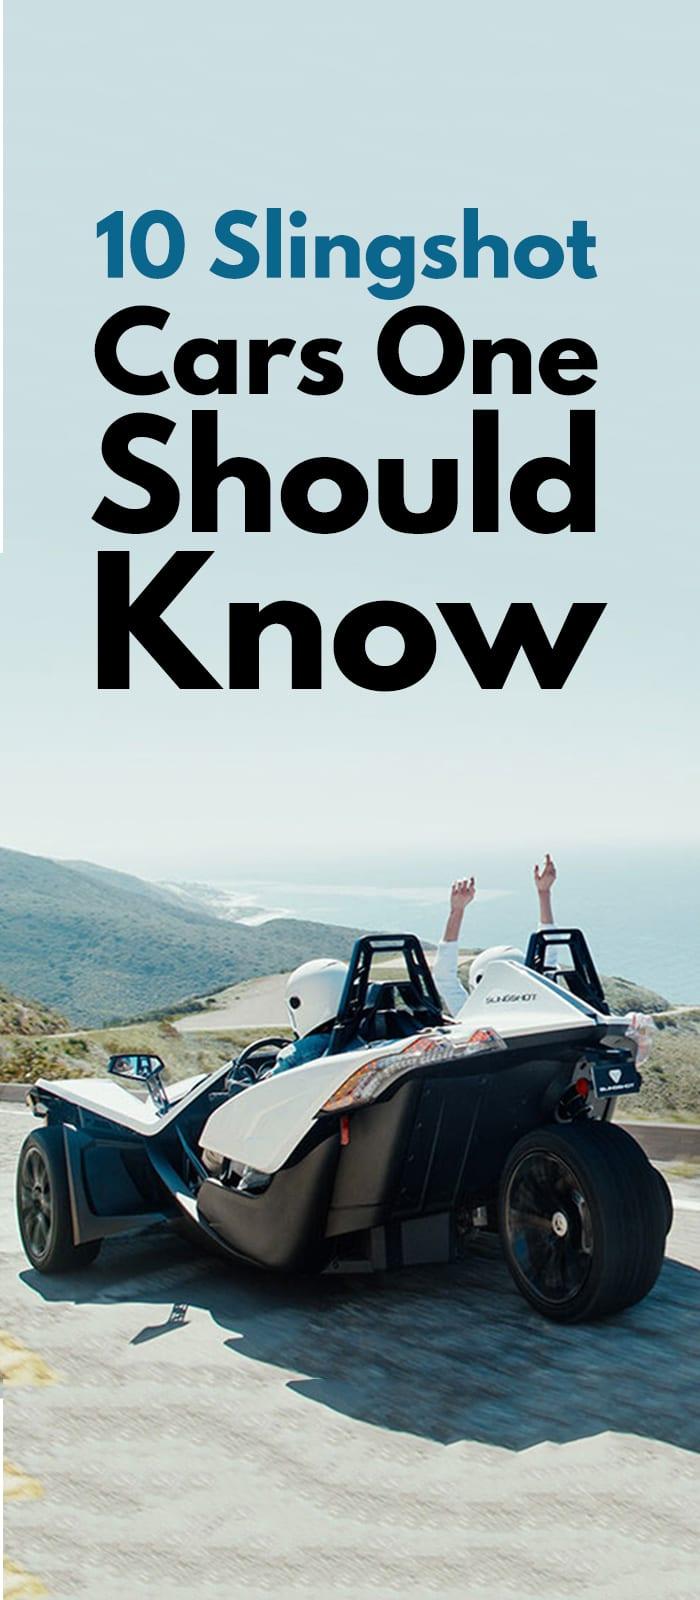 10 Slingshot Cars One Should Know!